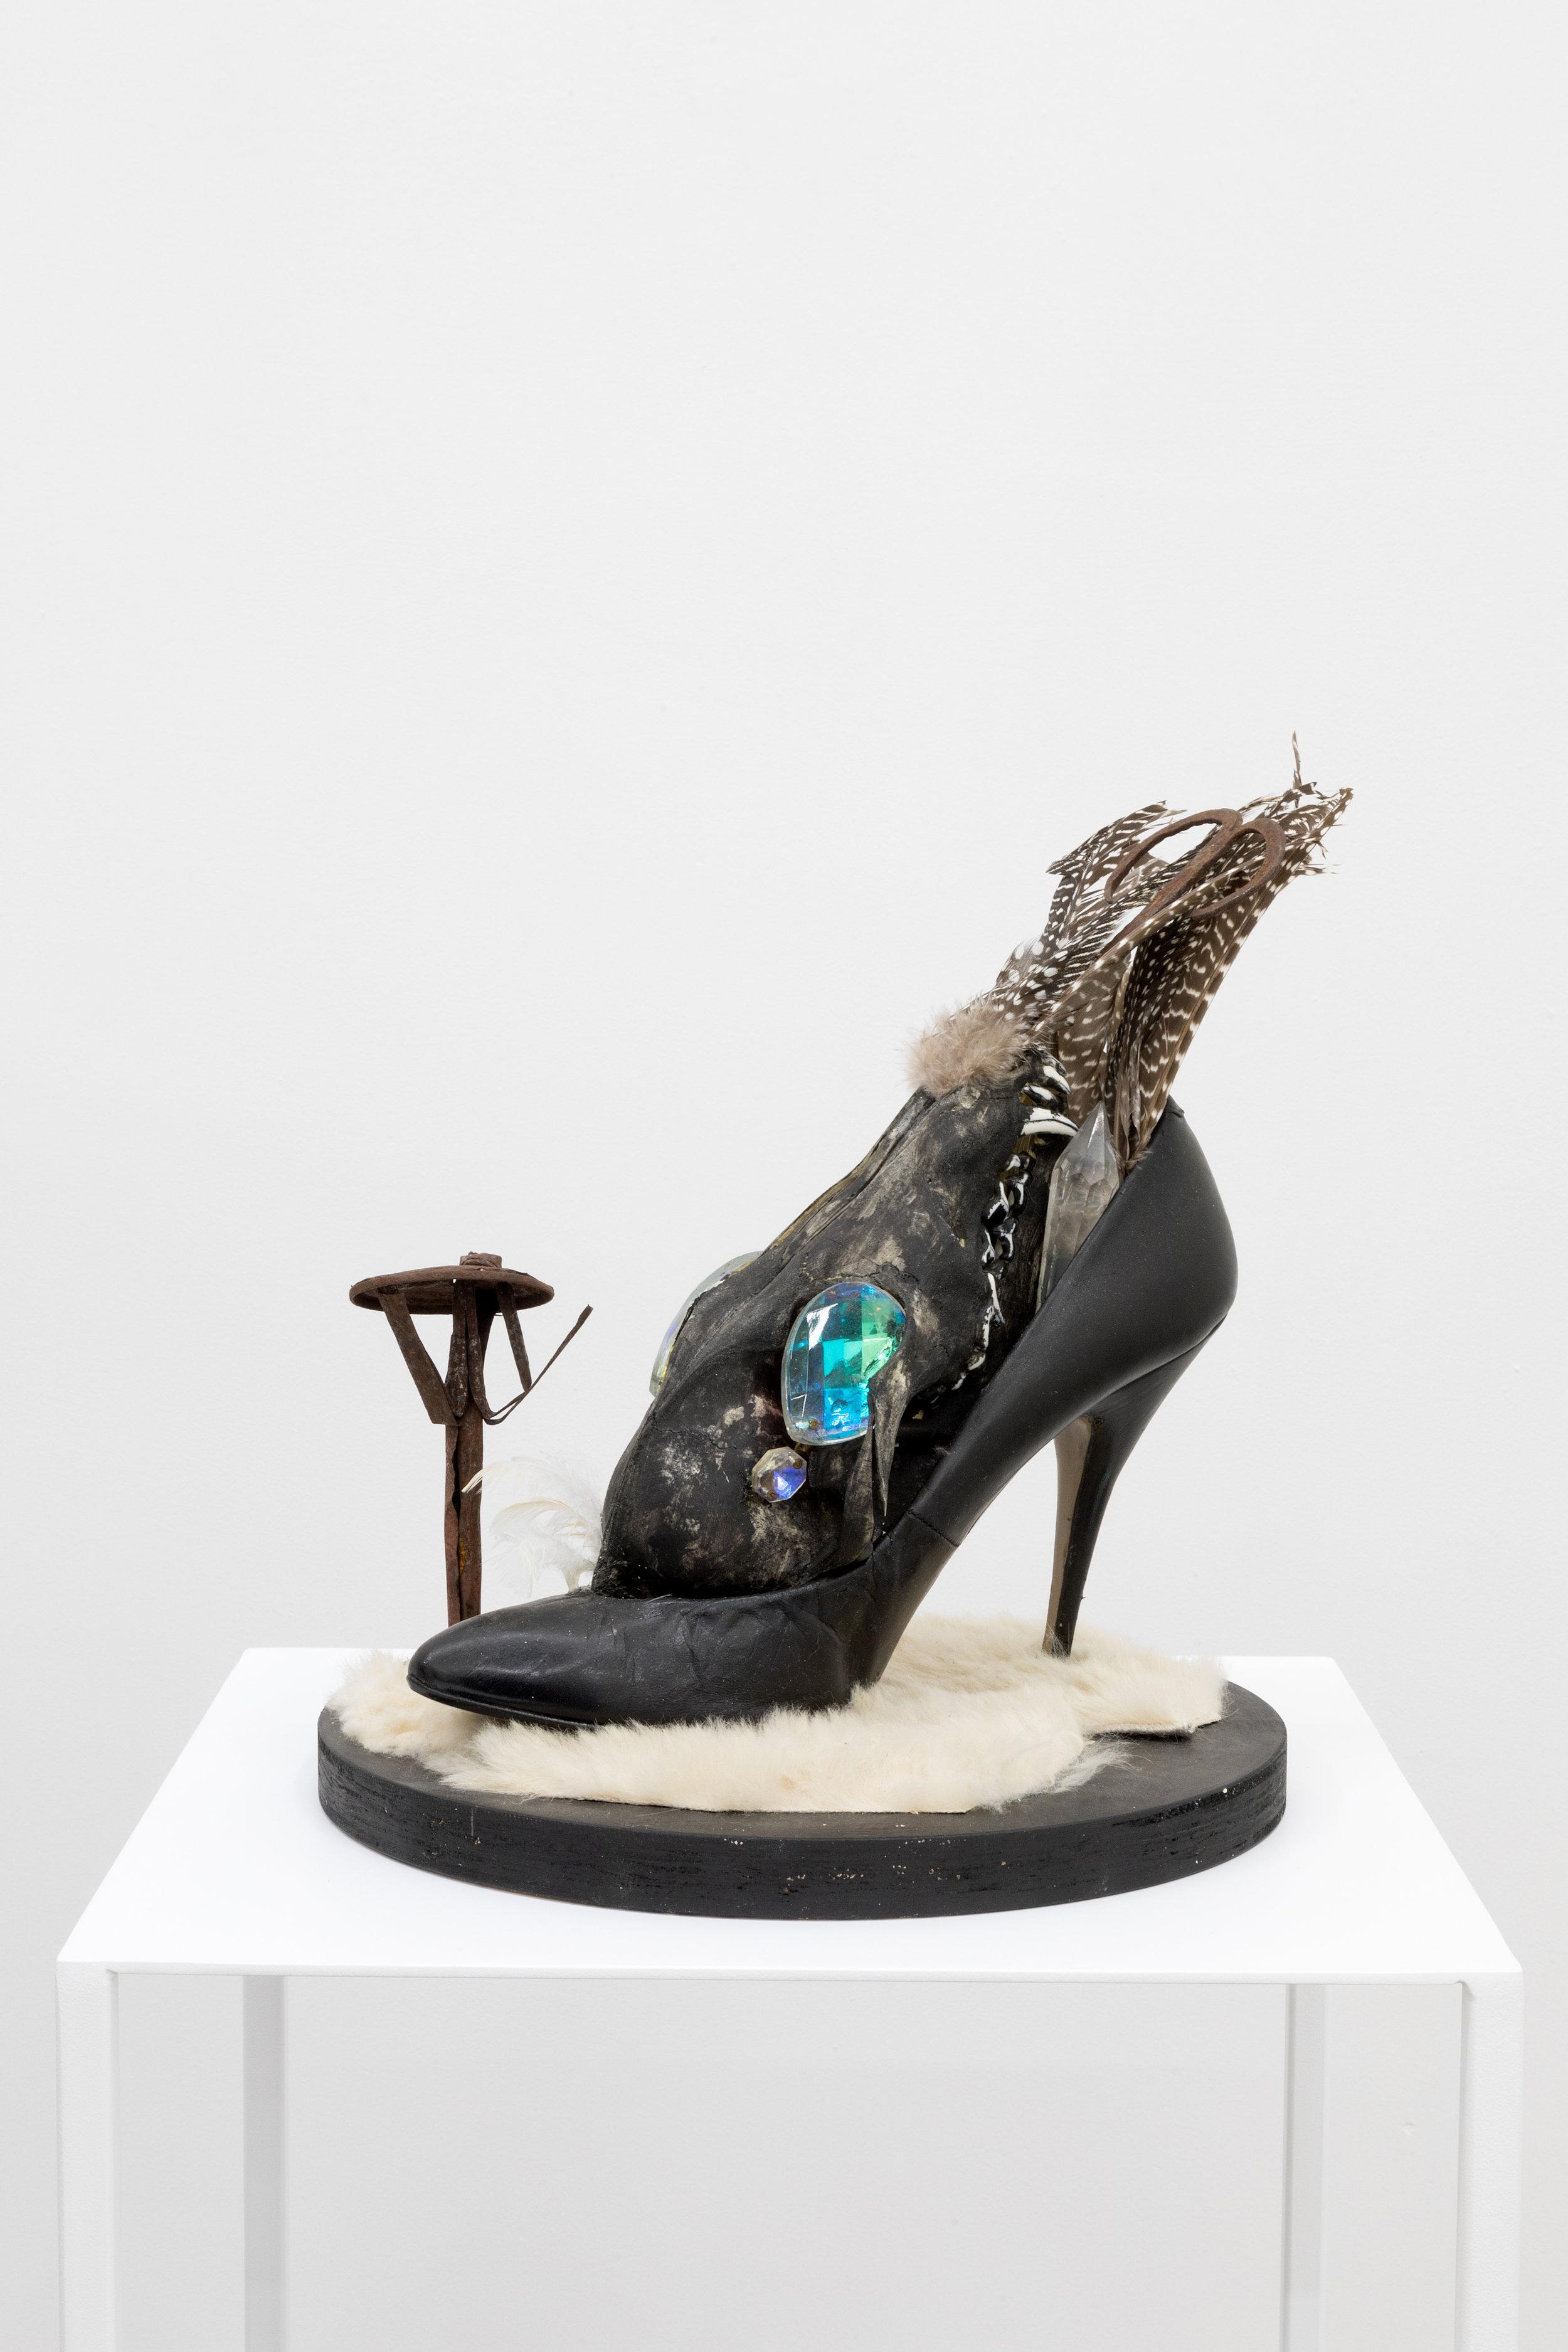 Genesis BREYER P-ORRIDGE,  Shoe Horn #6 , 2015, Horn, dominatrix shoe, Nepalese fabric-printing square, skull, feathers, Nepalese candle, gemstones, fur, 9 x 9 x 8 in